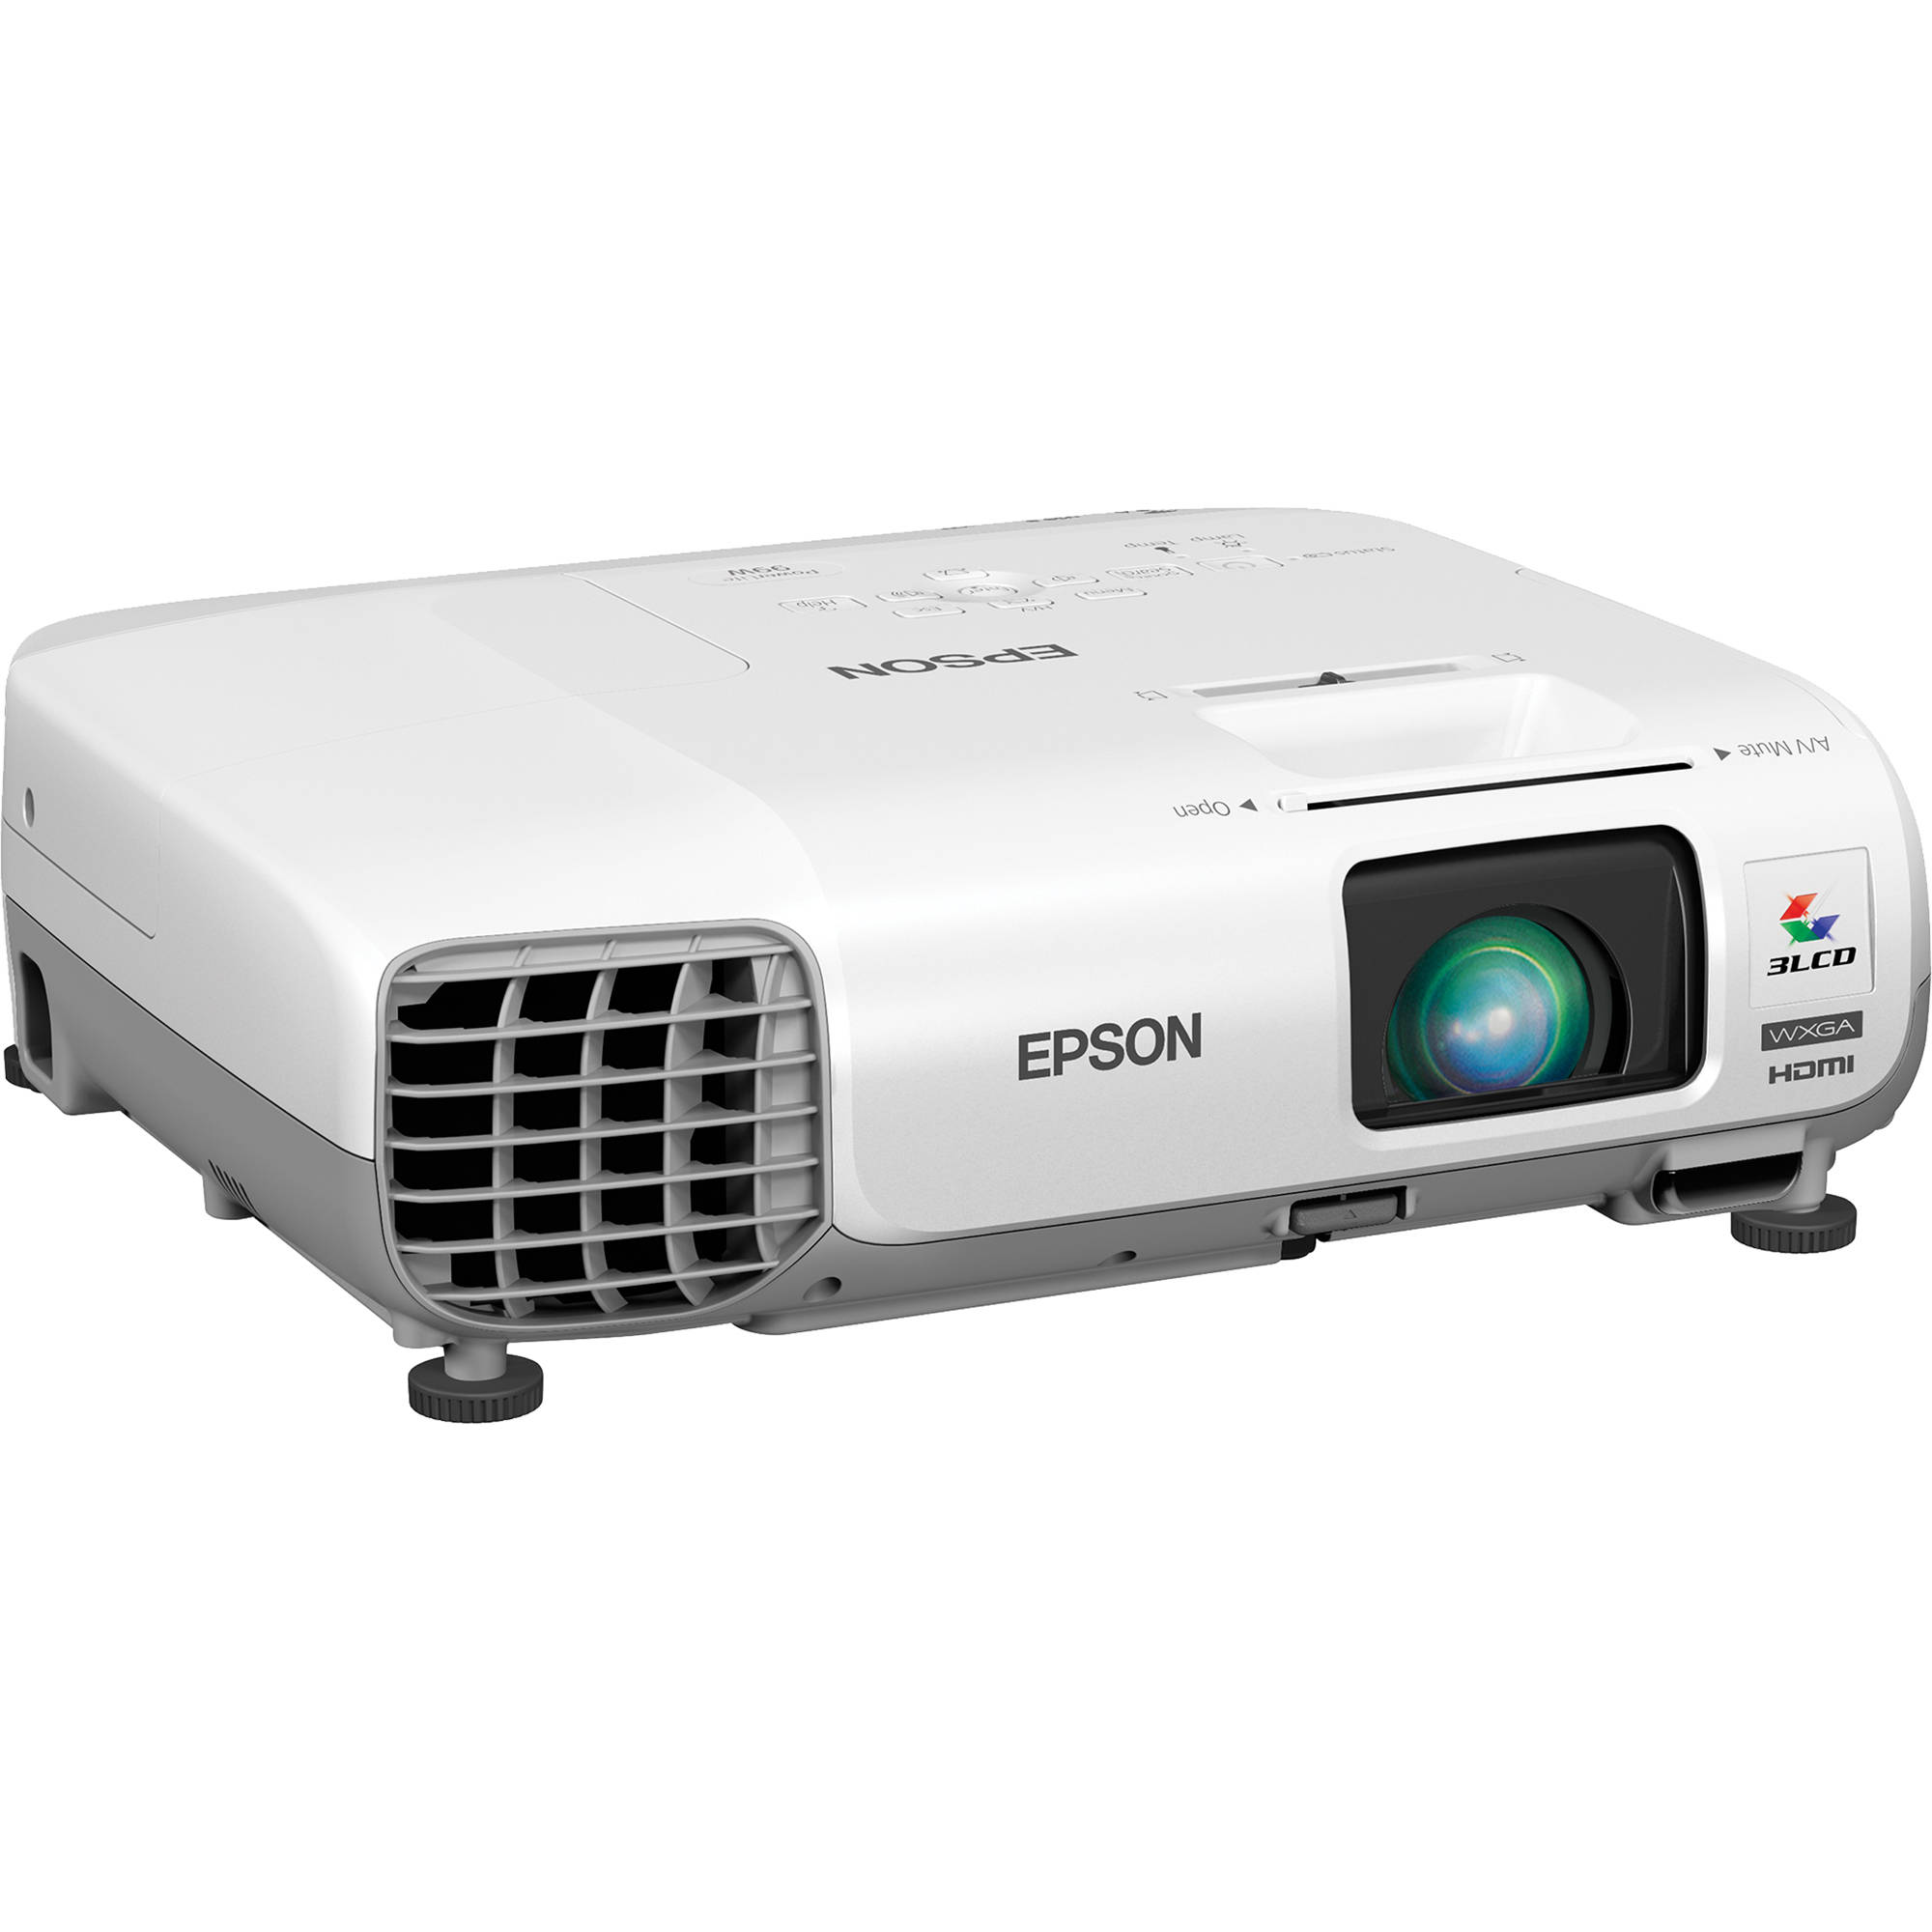 Epson PowerLite 99W WXGA 3LCD Projector